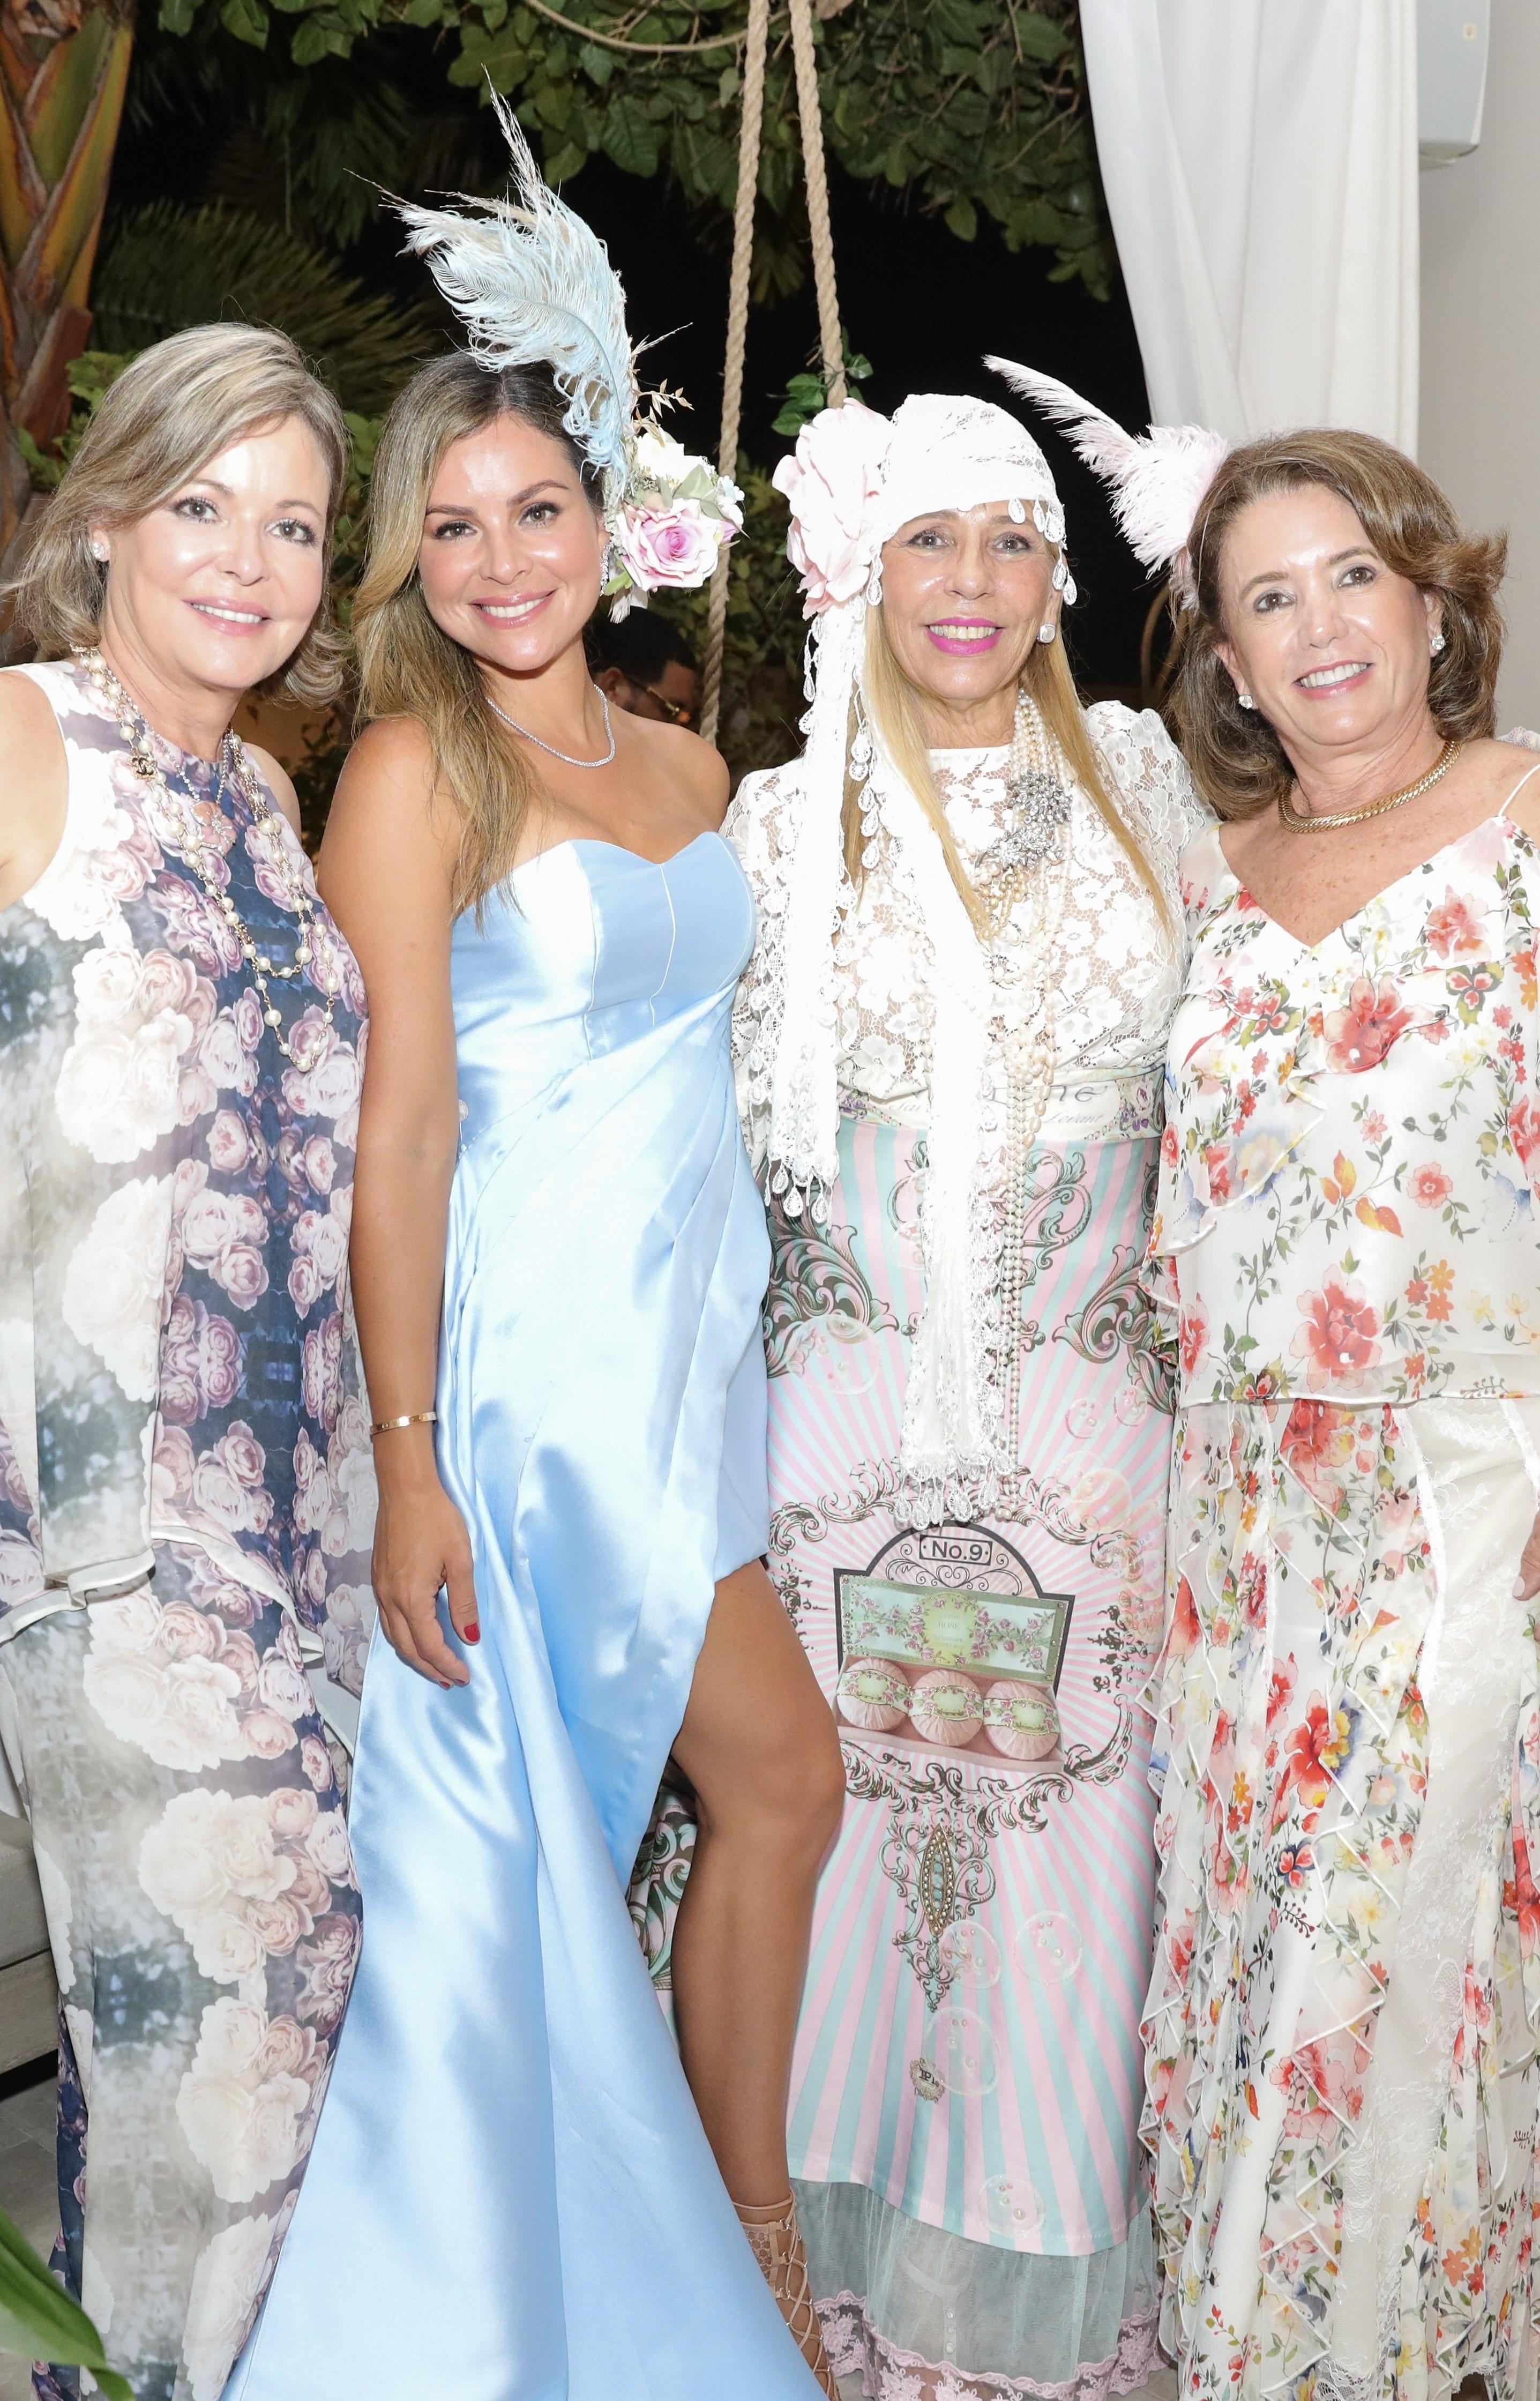 Neddy Vaillant, Mónica Ponce, Ivonne Da Silveira y Patricia de Varona. (Suministrada/Karina Margary)